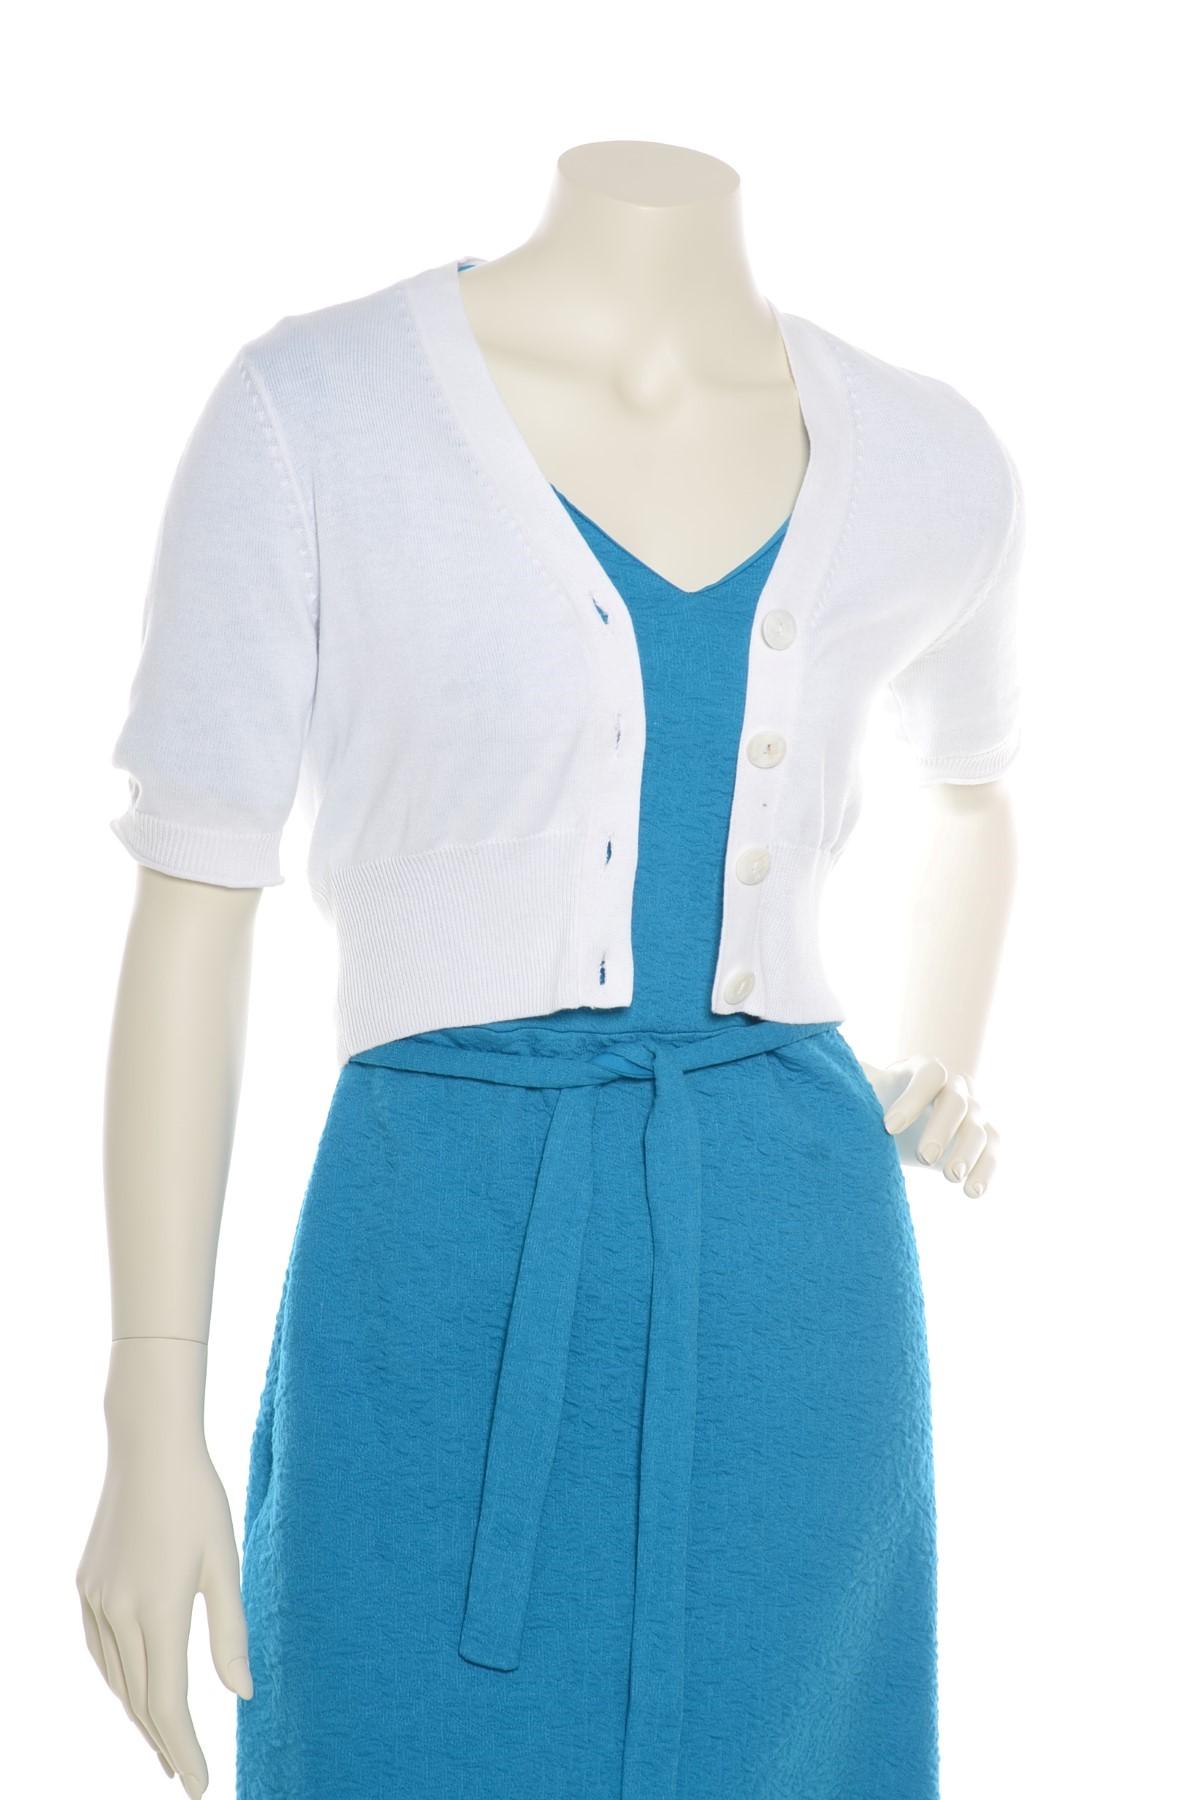 Beroemd Wow To Go jurk blauw dig » Casual TN18